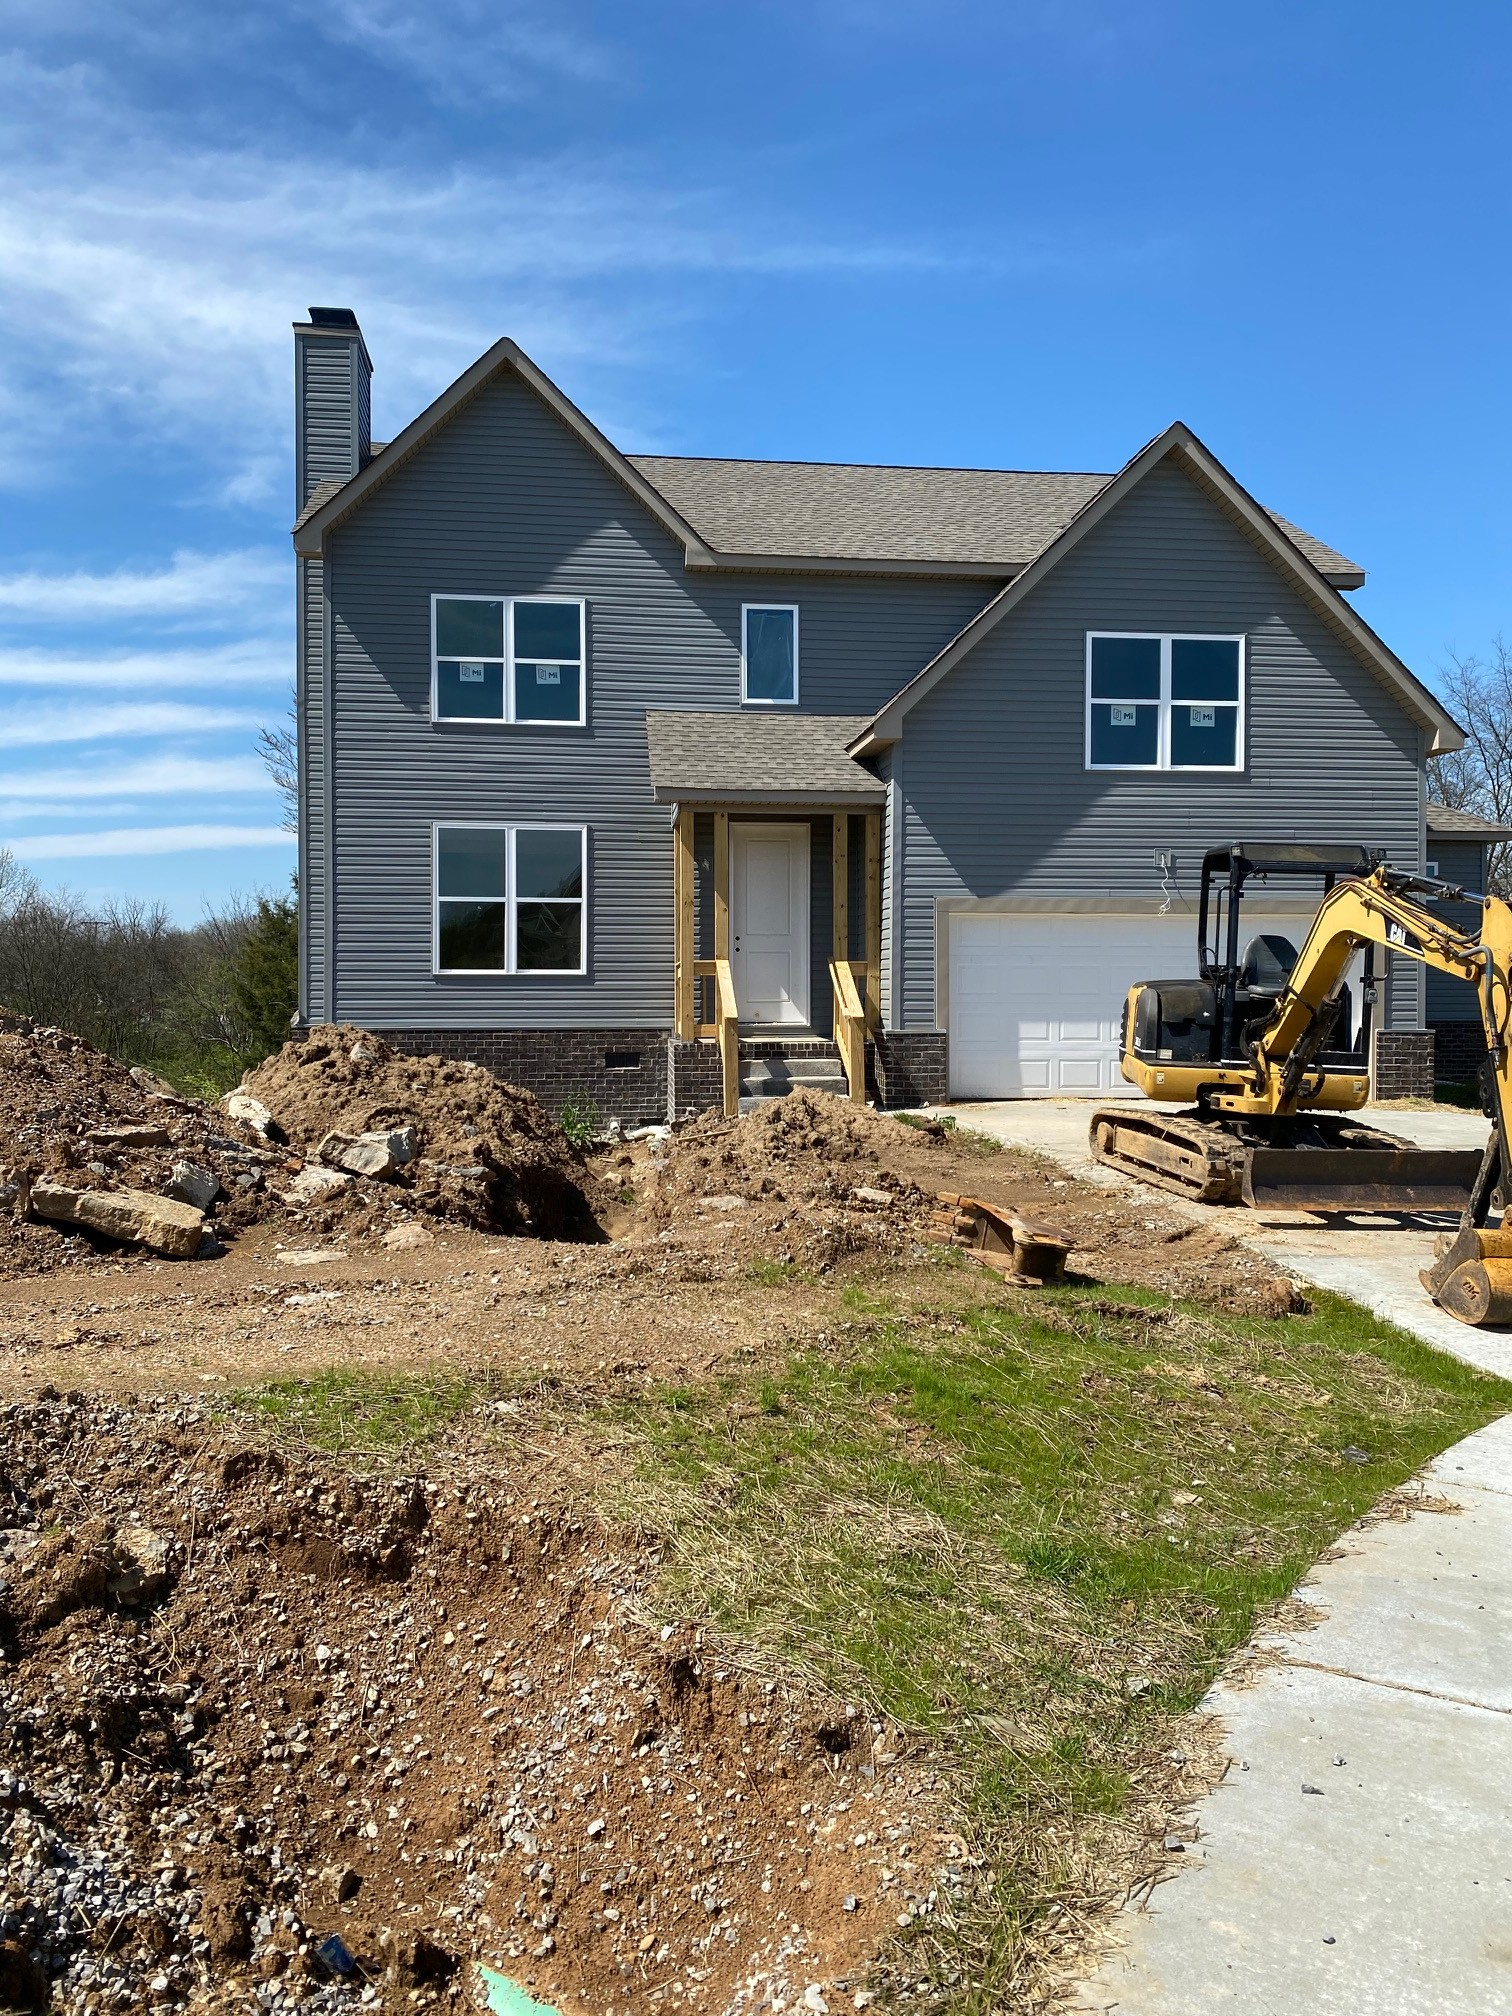 1533 Stoney River Ln, Madison, TN 37115 - Madison, TN real estate listing